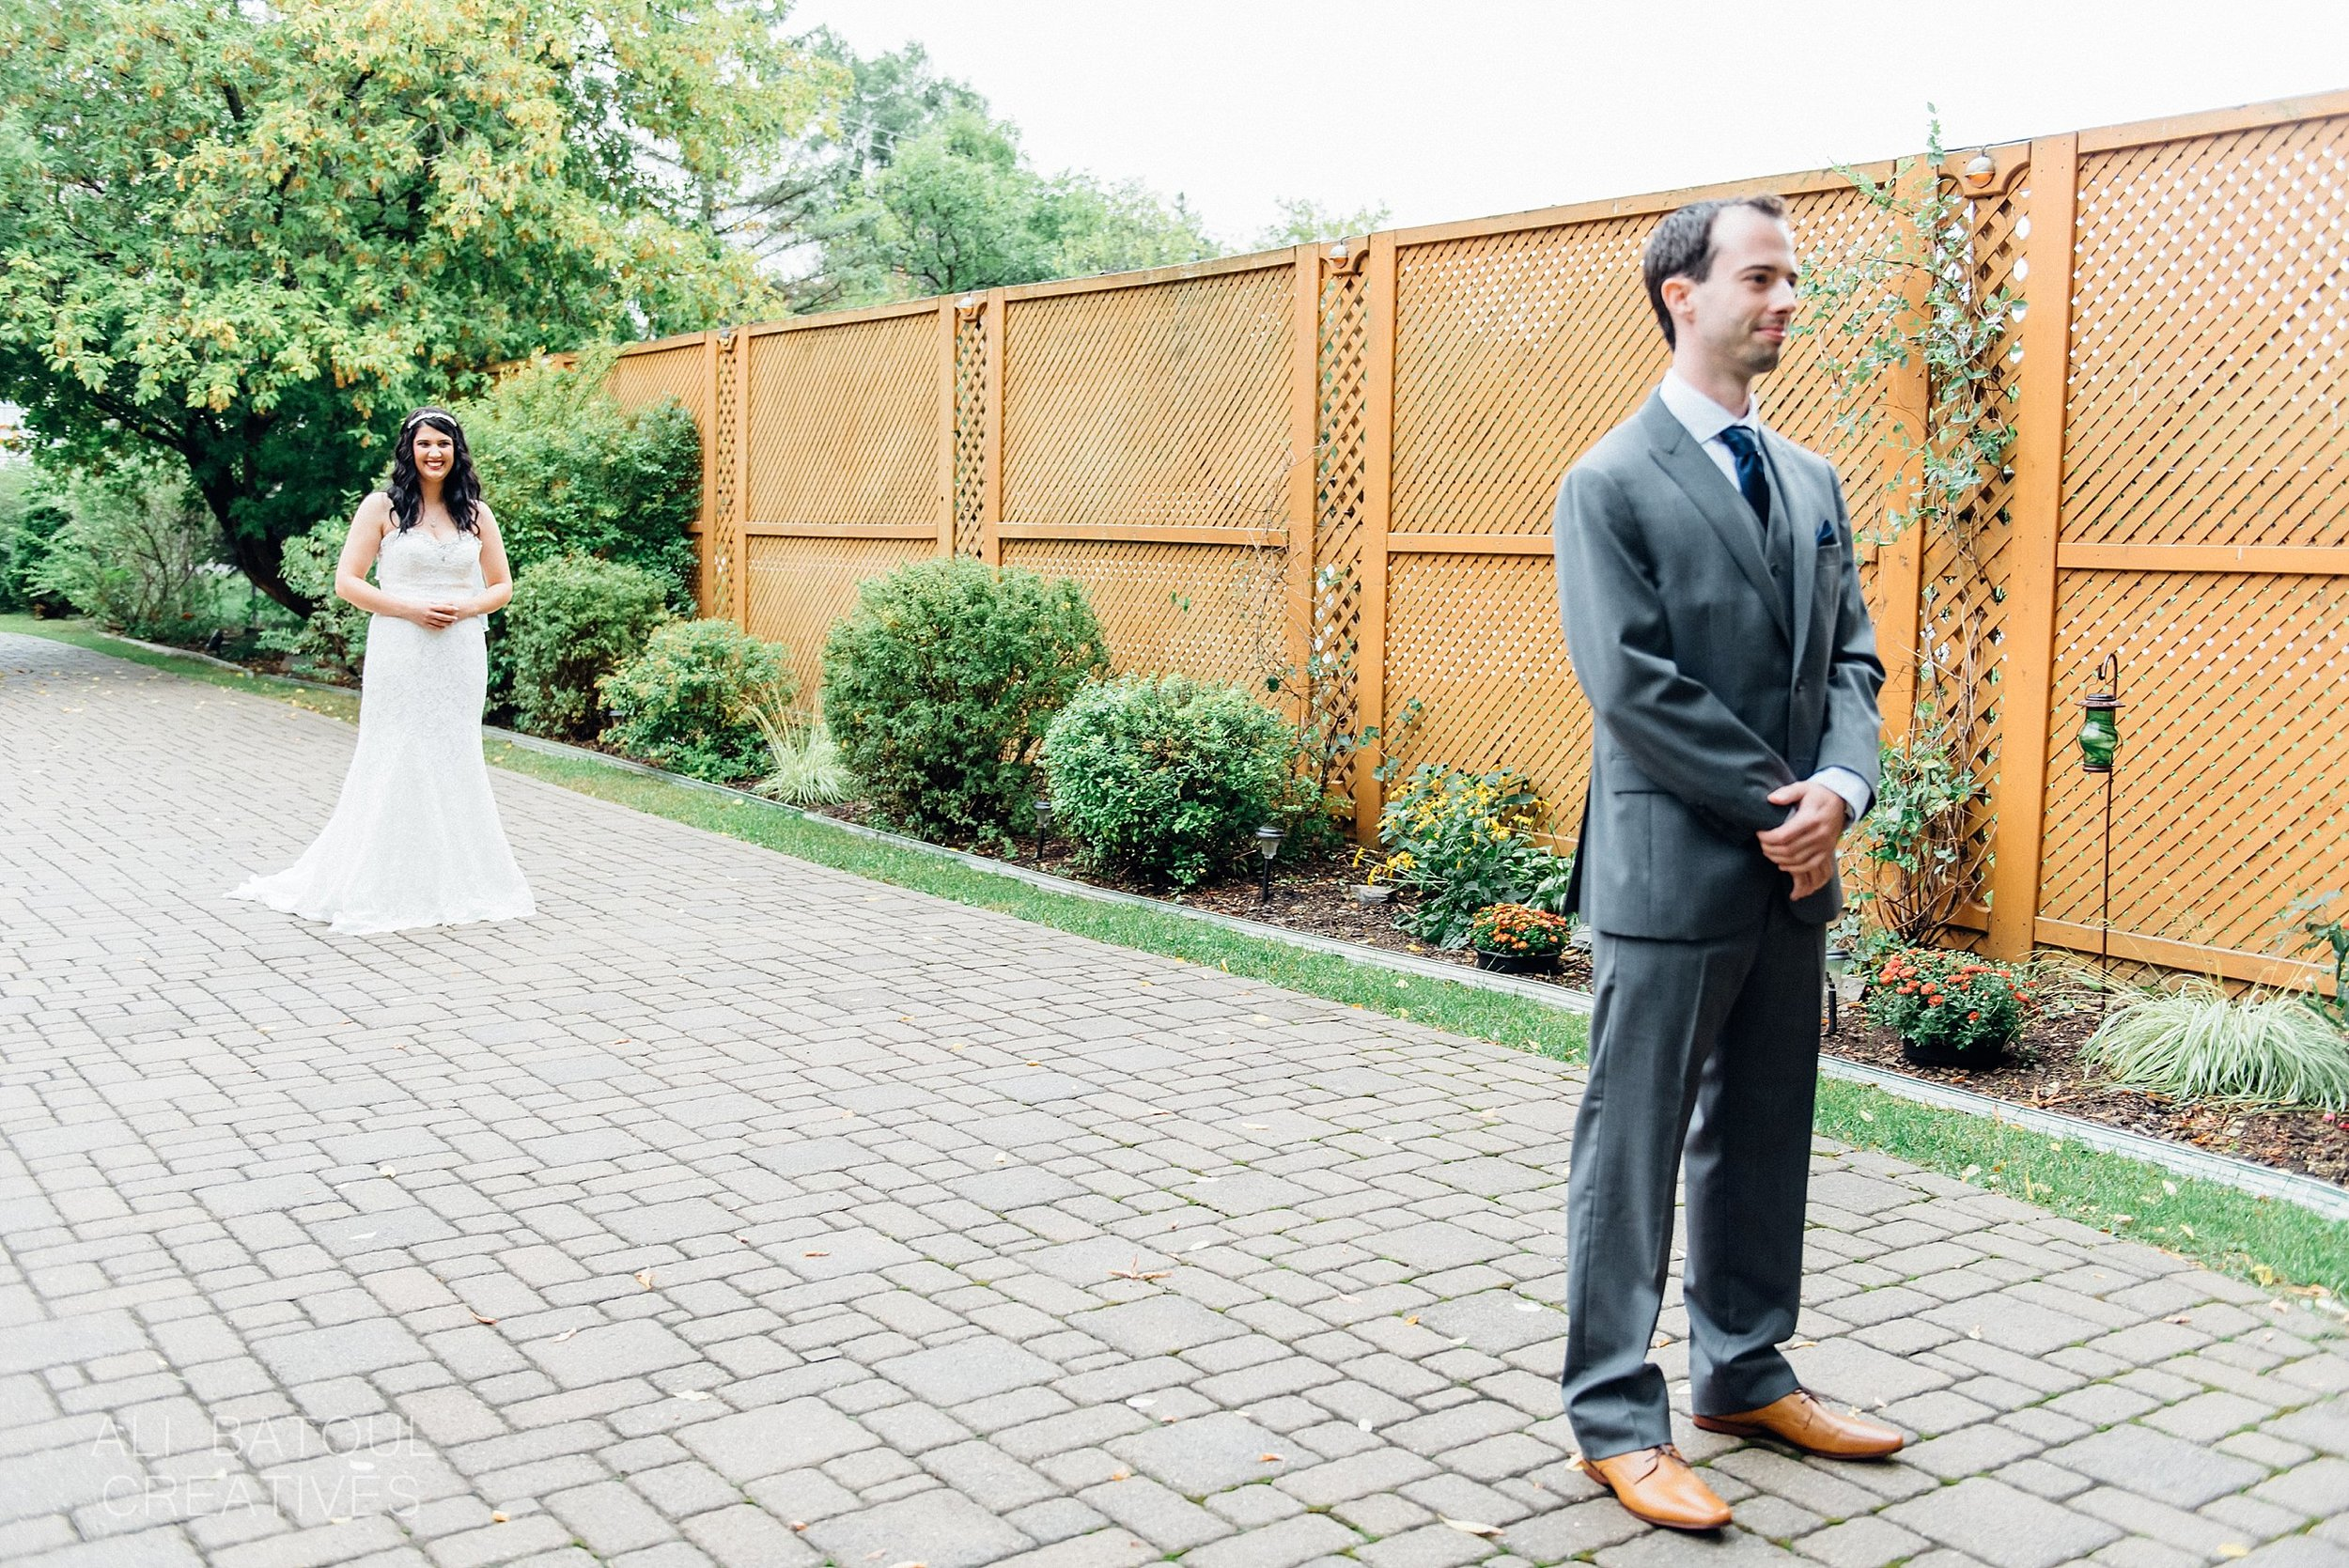 Jocelyn + Steve At The Schoolhouse Wedding - Ali and Batoul Fine Art Wedding Photography_0025.jpg